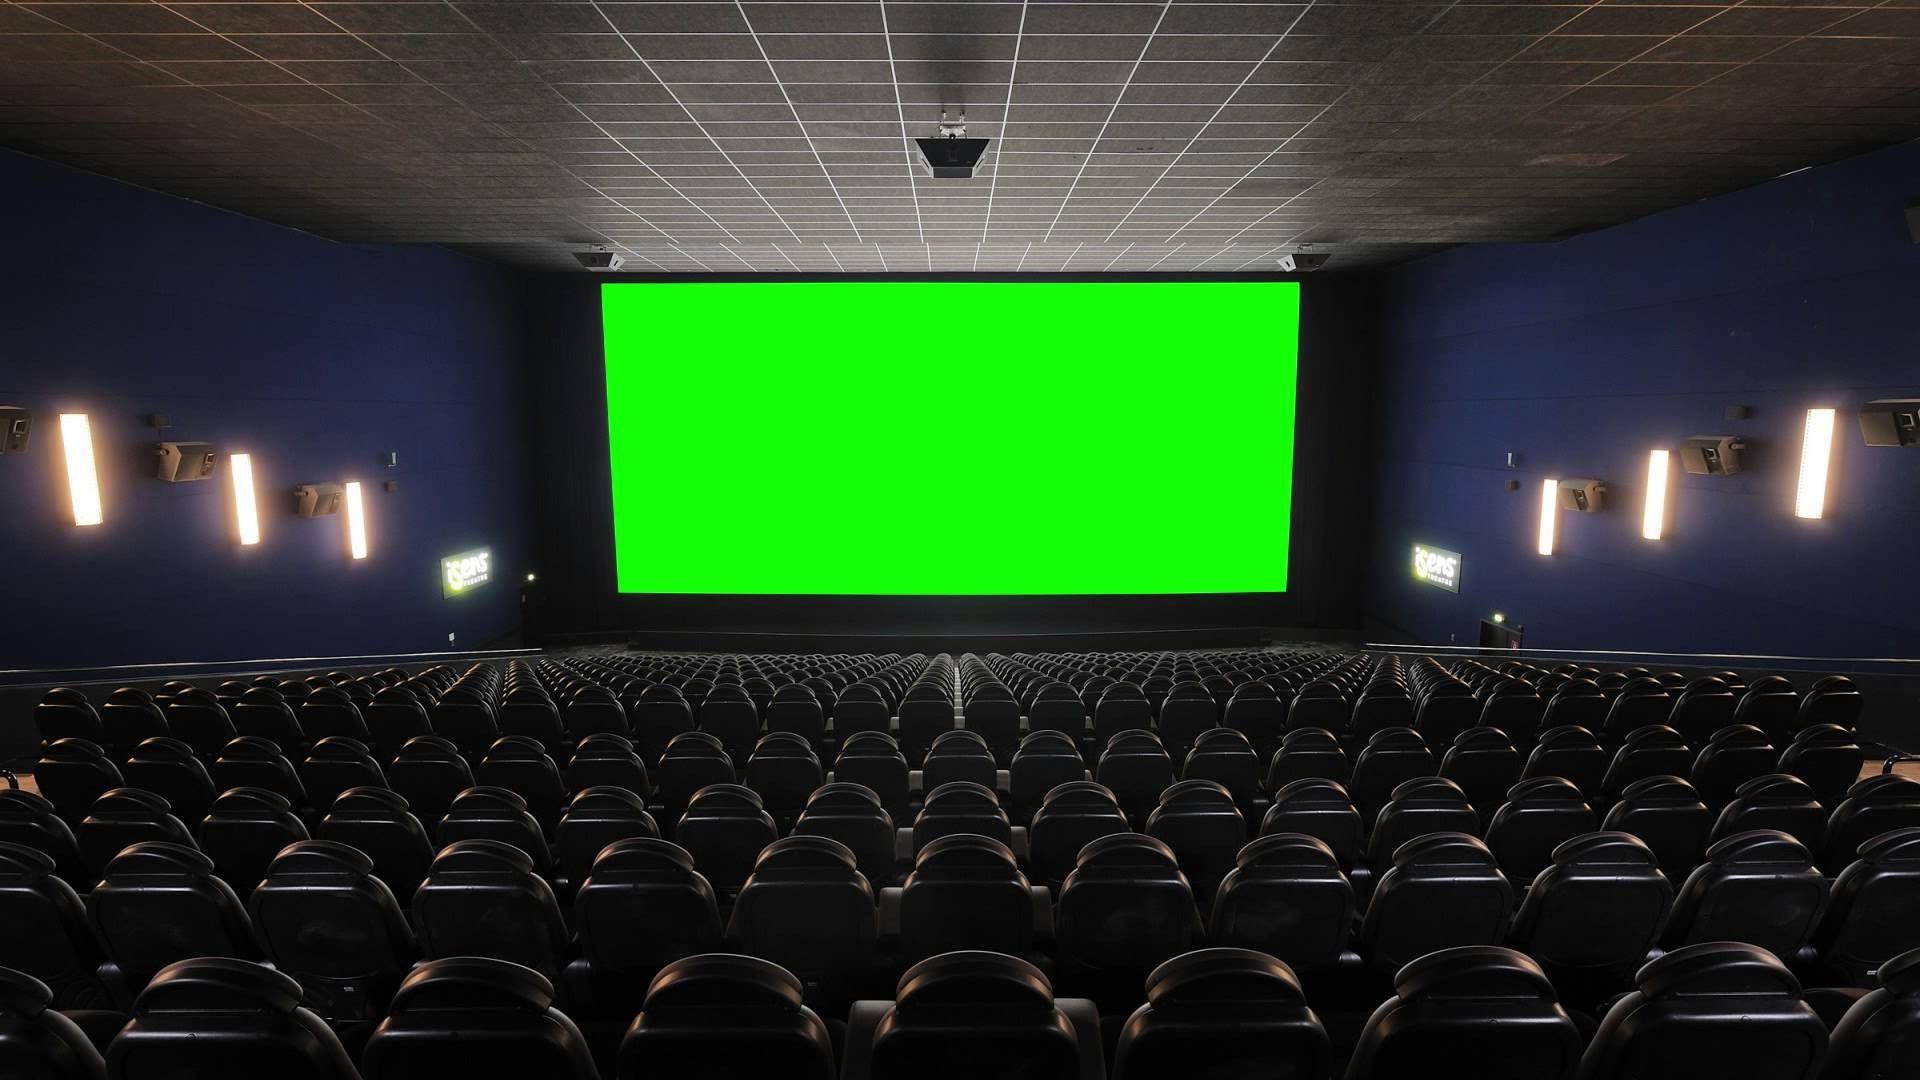 Movie Wallpaper Desktop Desktop Wallpaper Movie Wallpapers Greenscreen